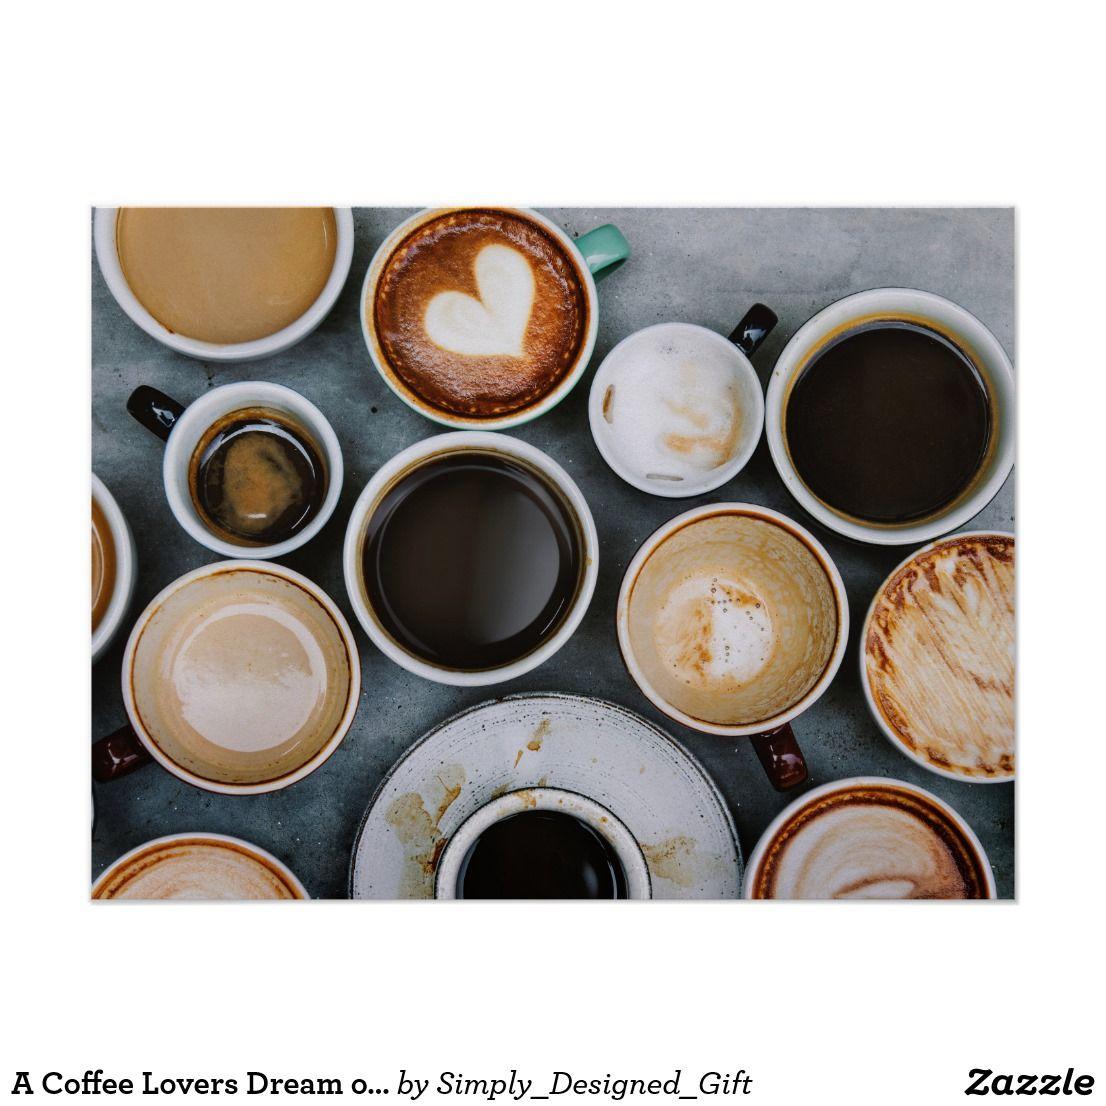 A Coffee Lovers Dream Of Caffeine Poster Zazzle Com In 2020 Coffee Type Coffee Drinks Cozy Drinks